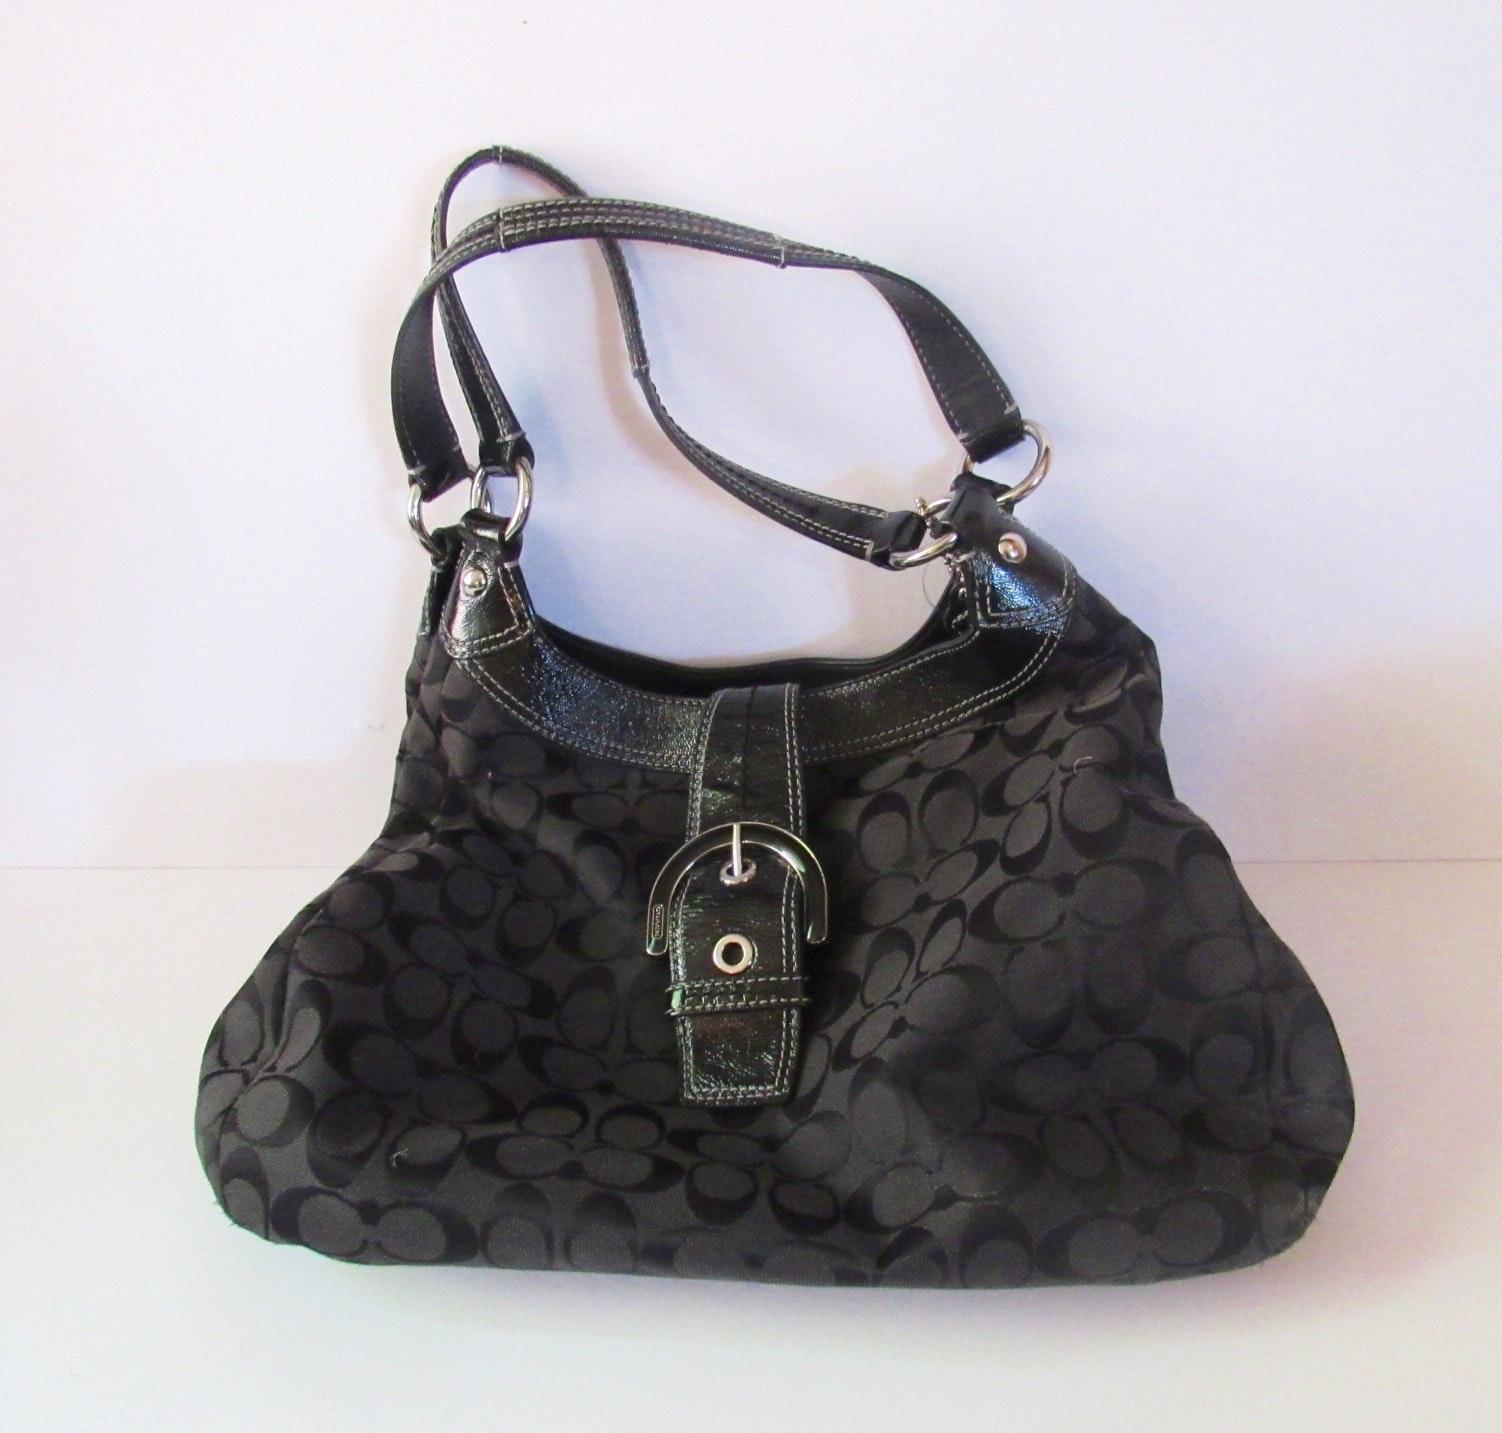 Coach Black Patent Leather and Fabric Handbag